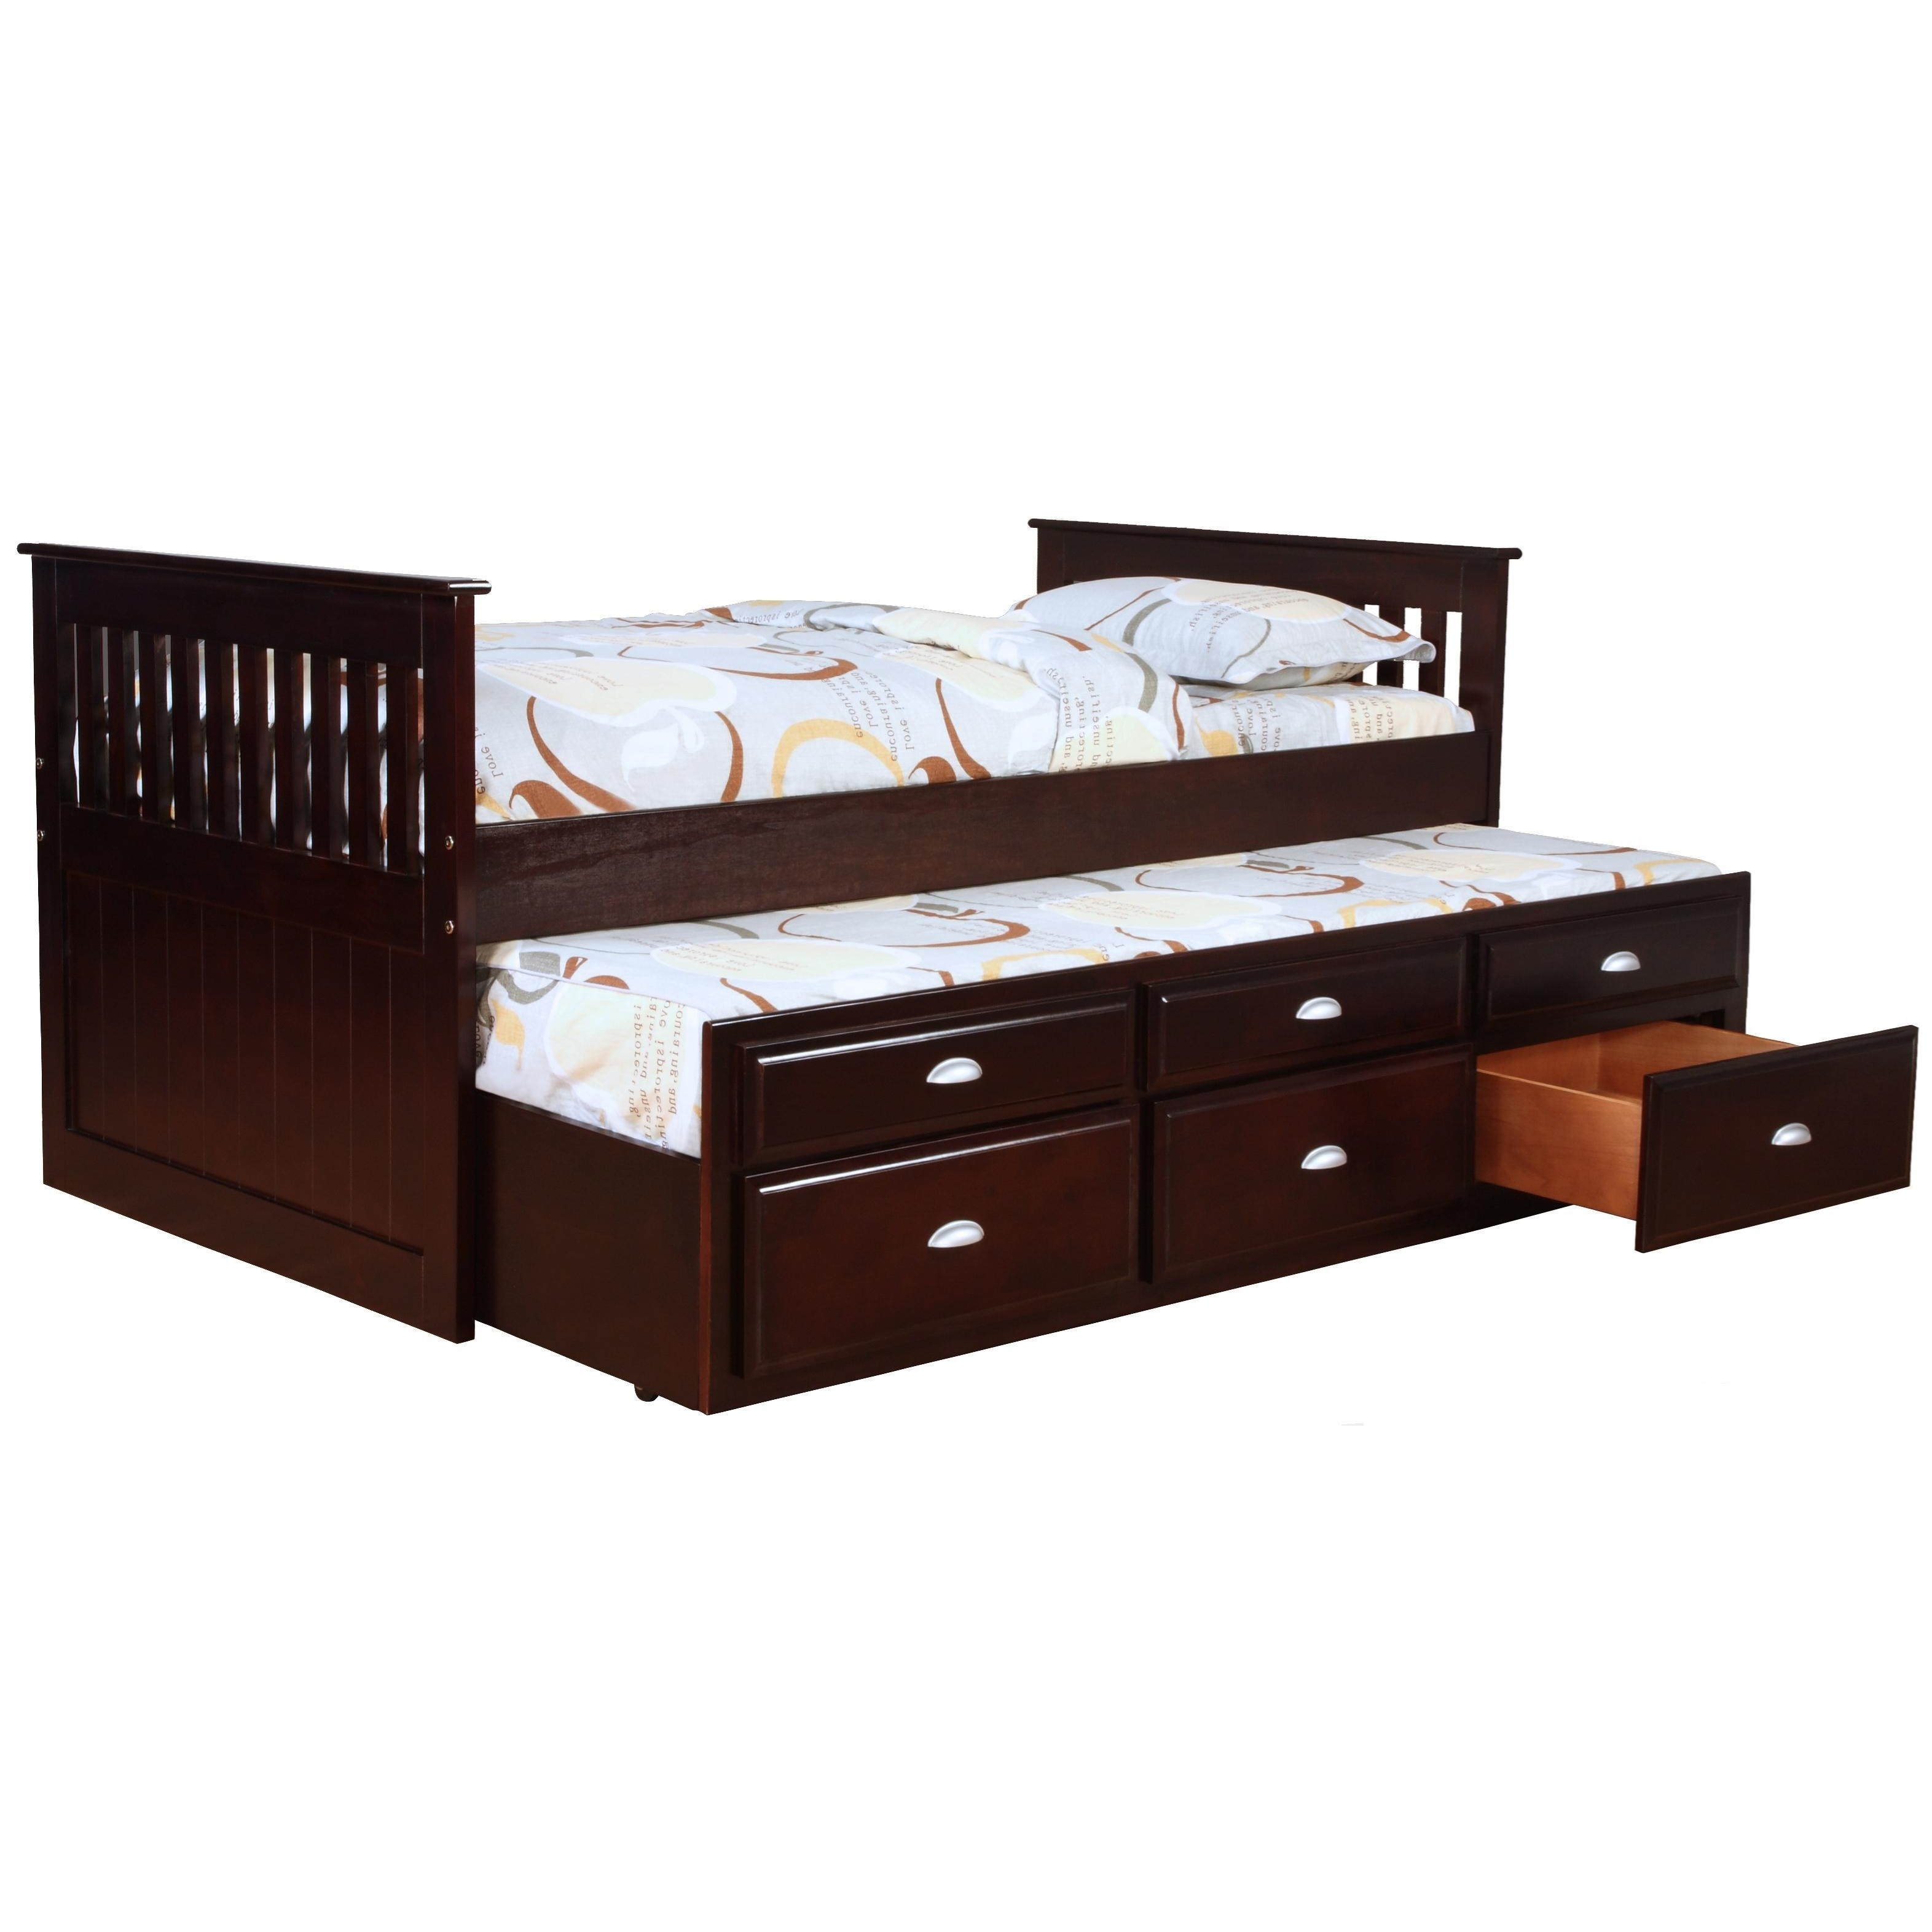 captains bed bernards logan captainu0027s bed with trundle and storage - item number: 3040v NSJAHSO